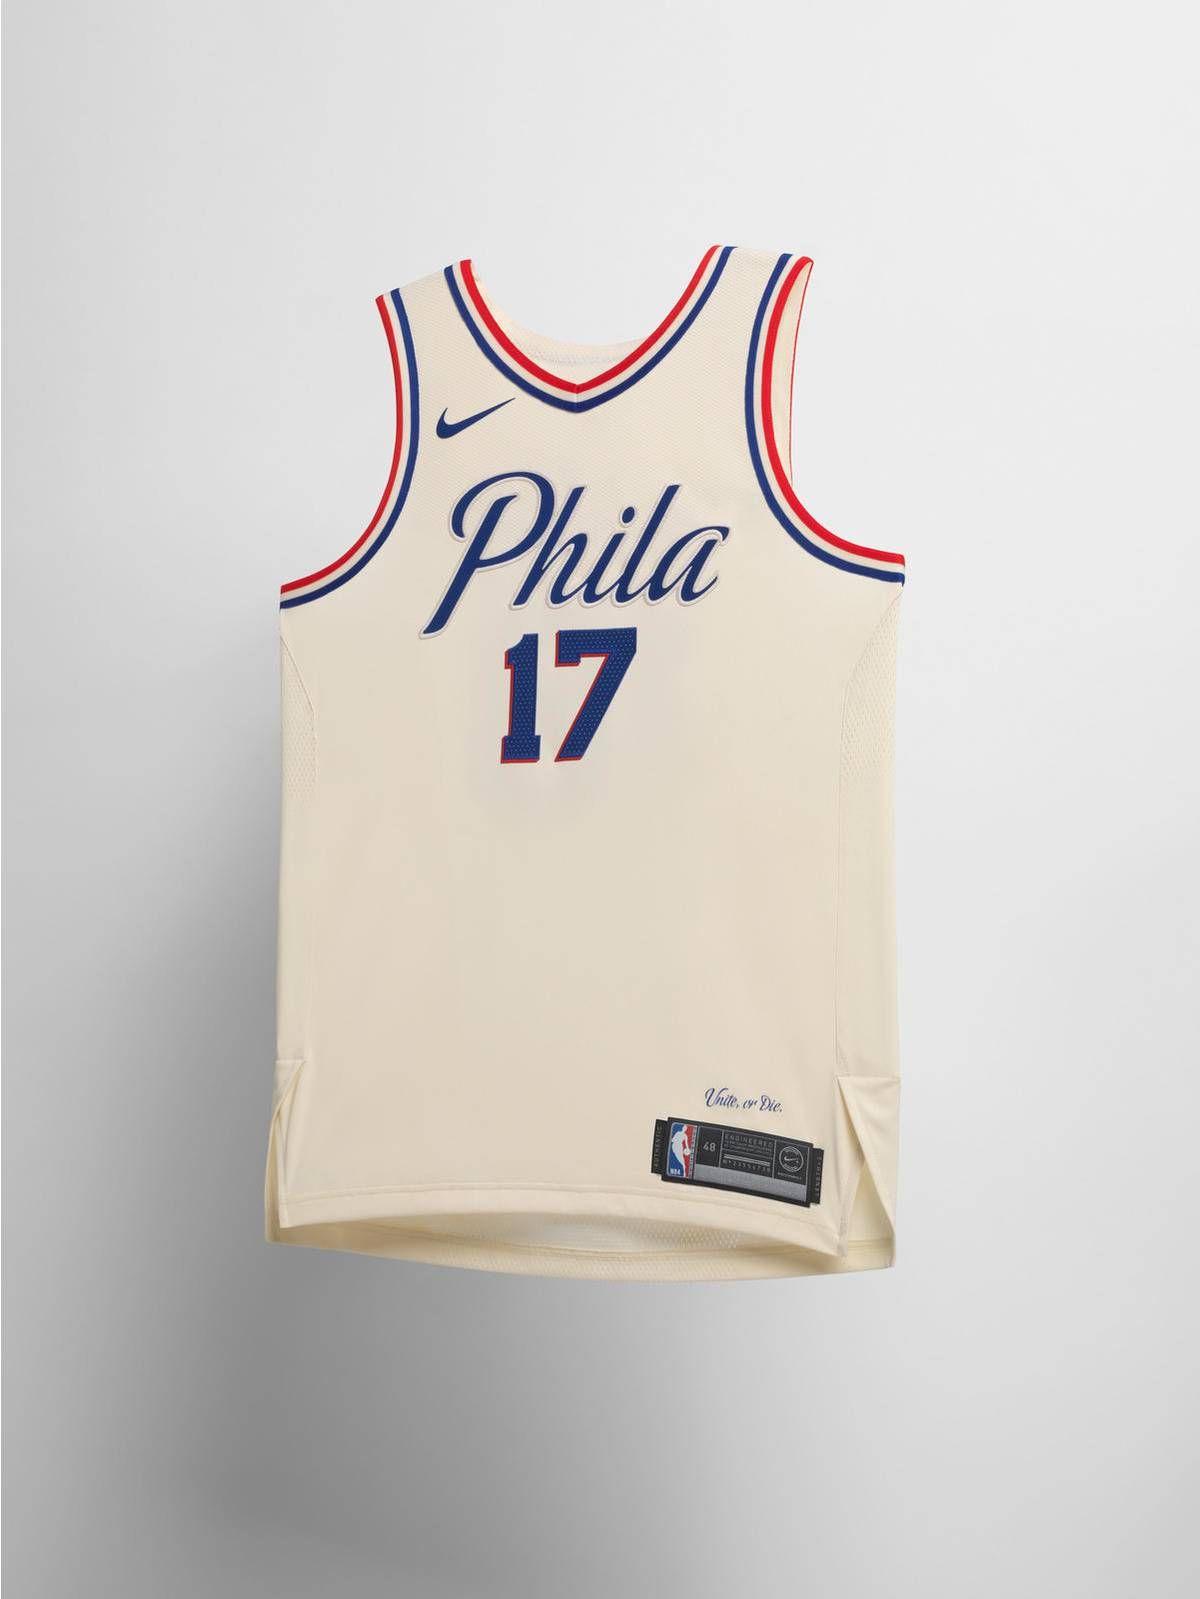 c0761e20551 Nike Philadelphia Sixers NBA City Edition jersey